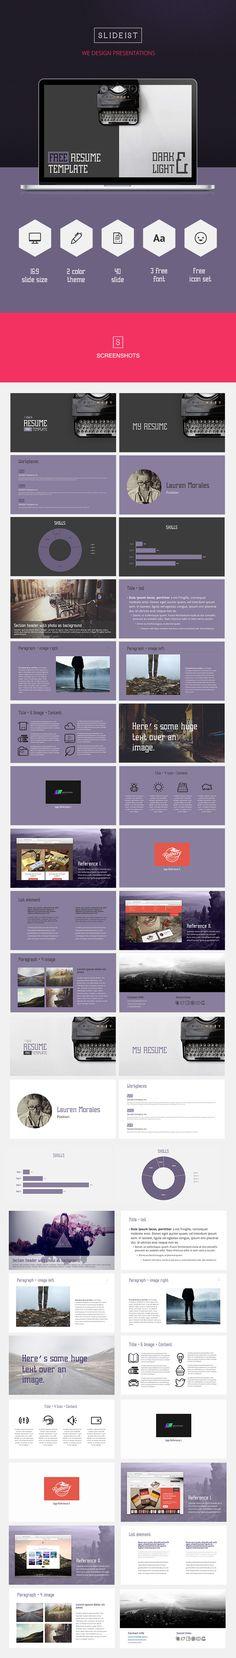 RESUME // Free PowerPoint presentation template